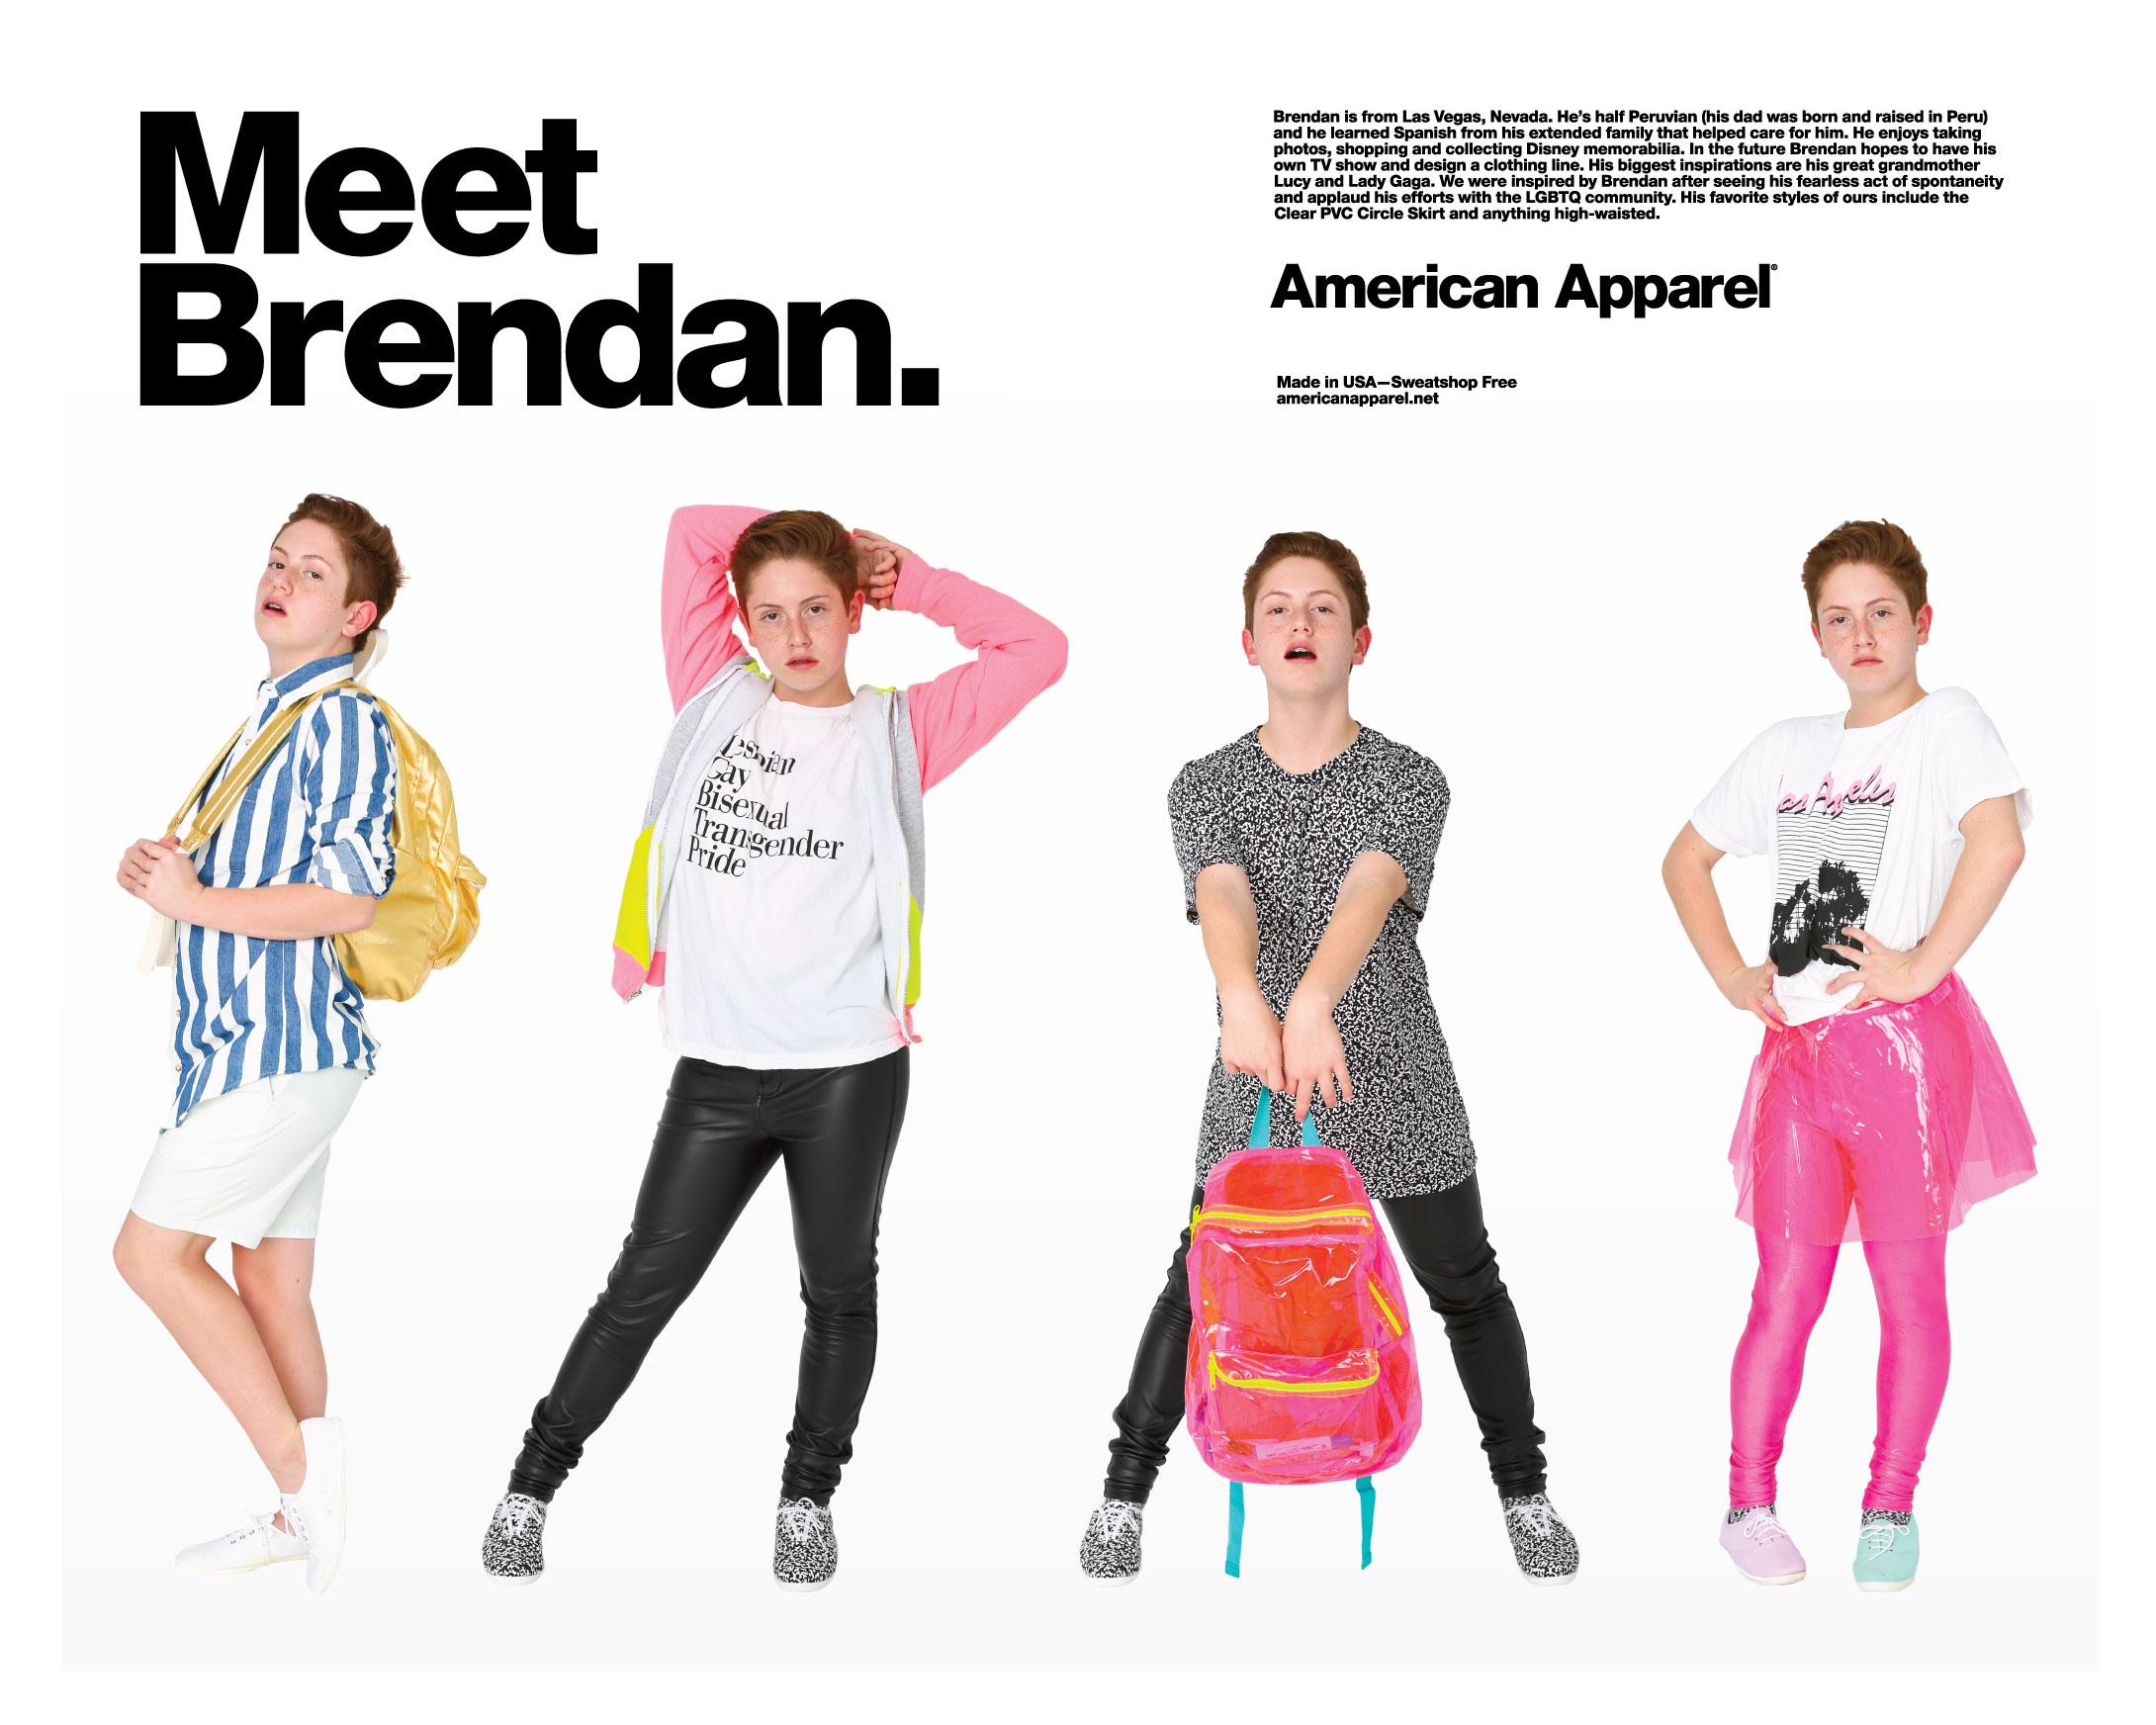 Brendam Jordan american apparel modelo celebridade internet